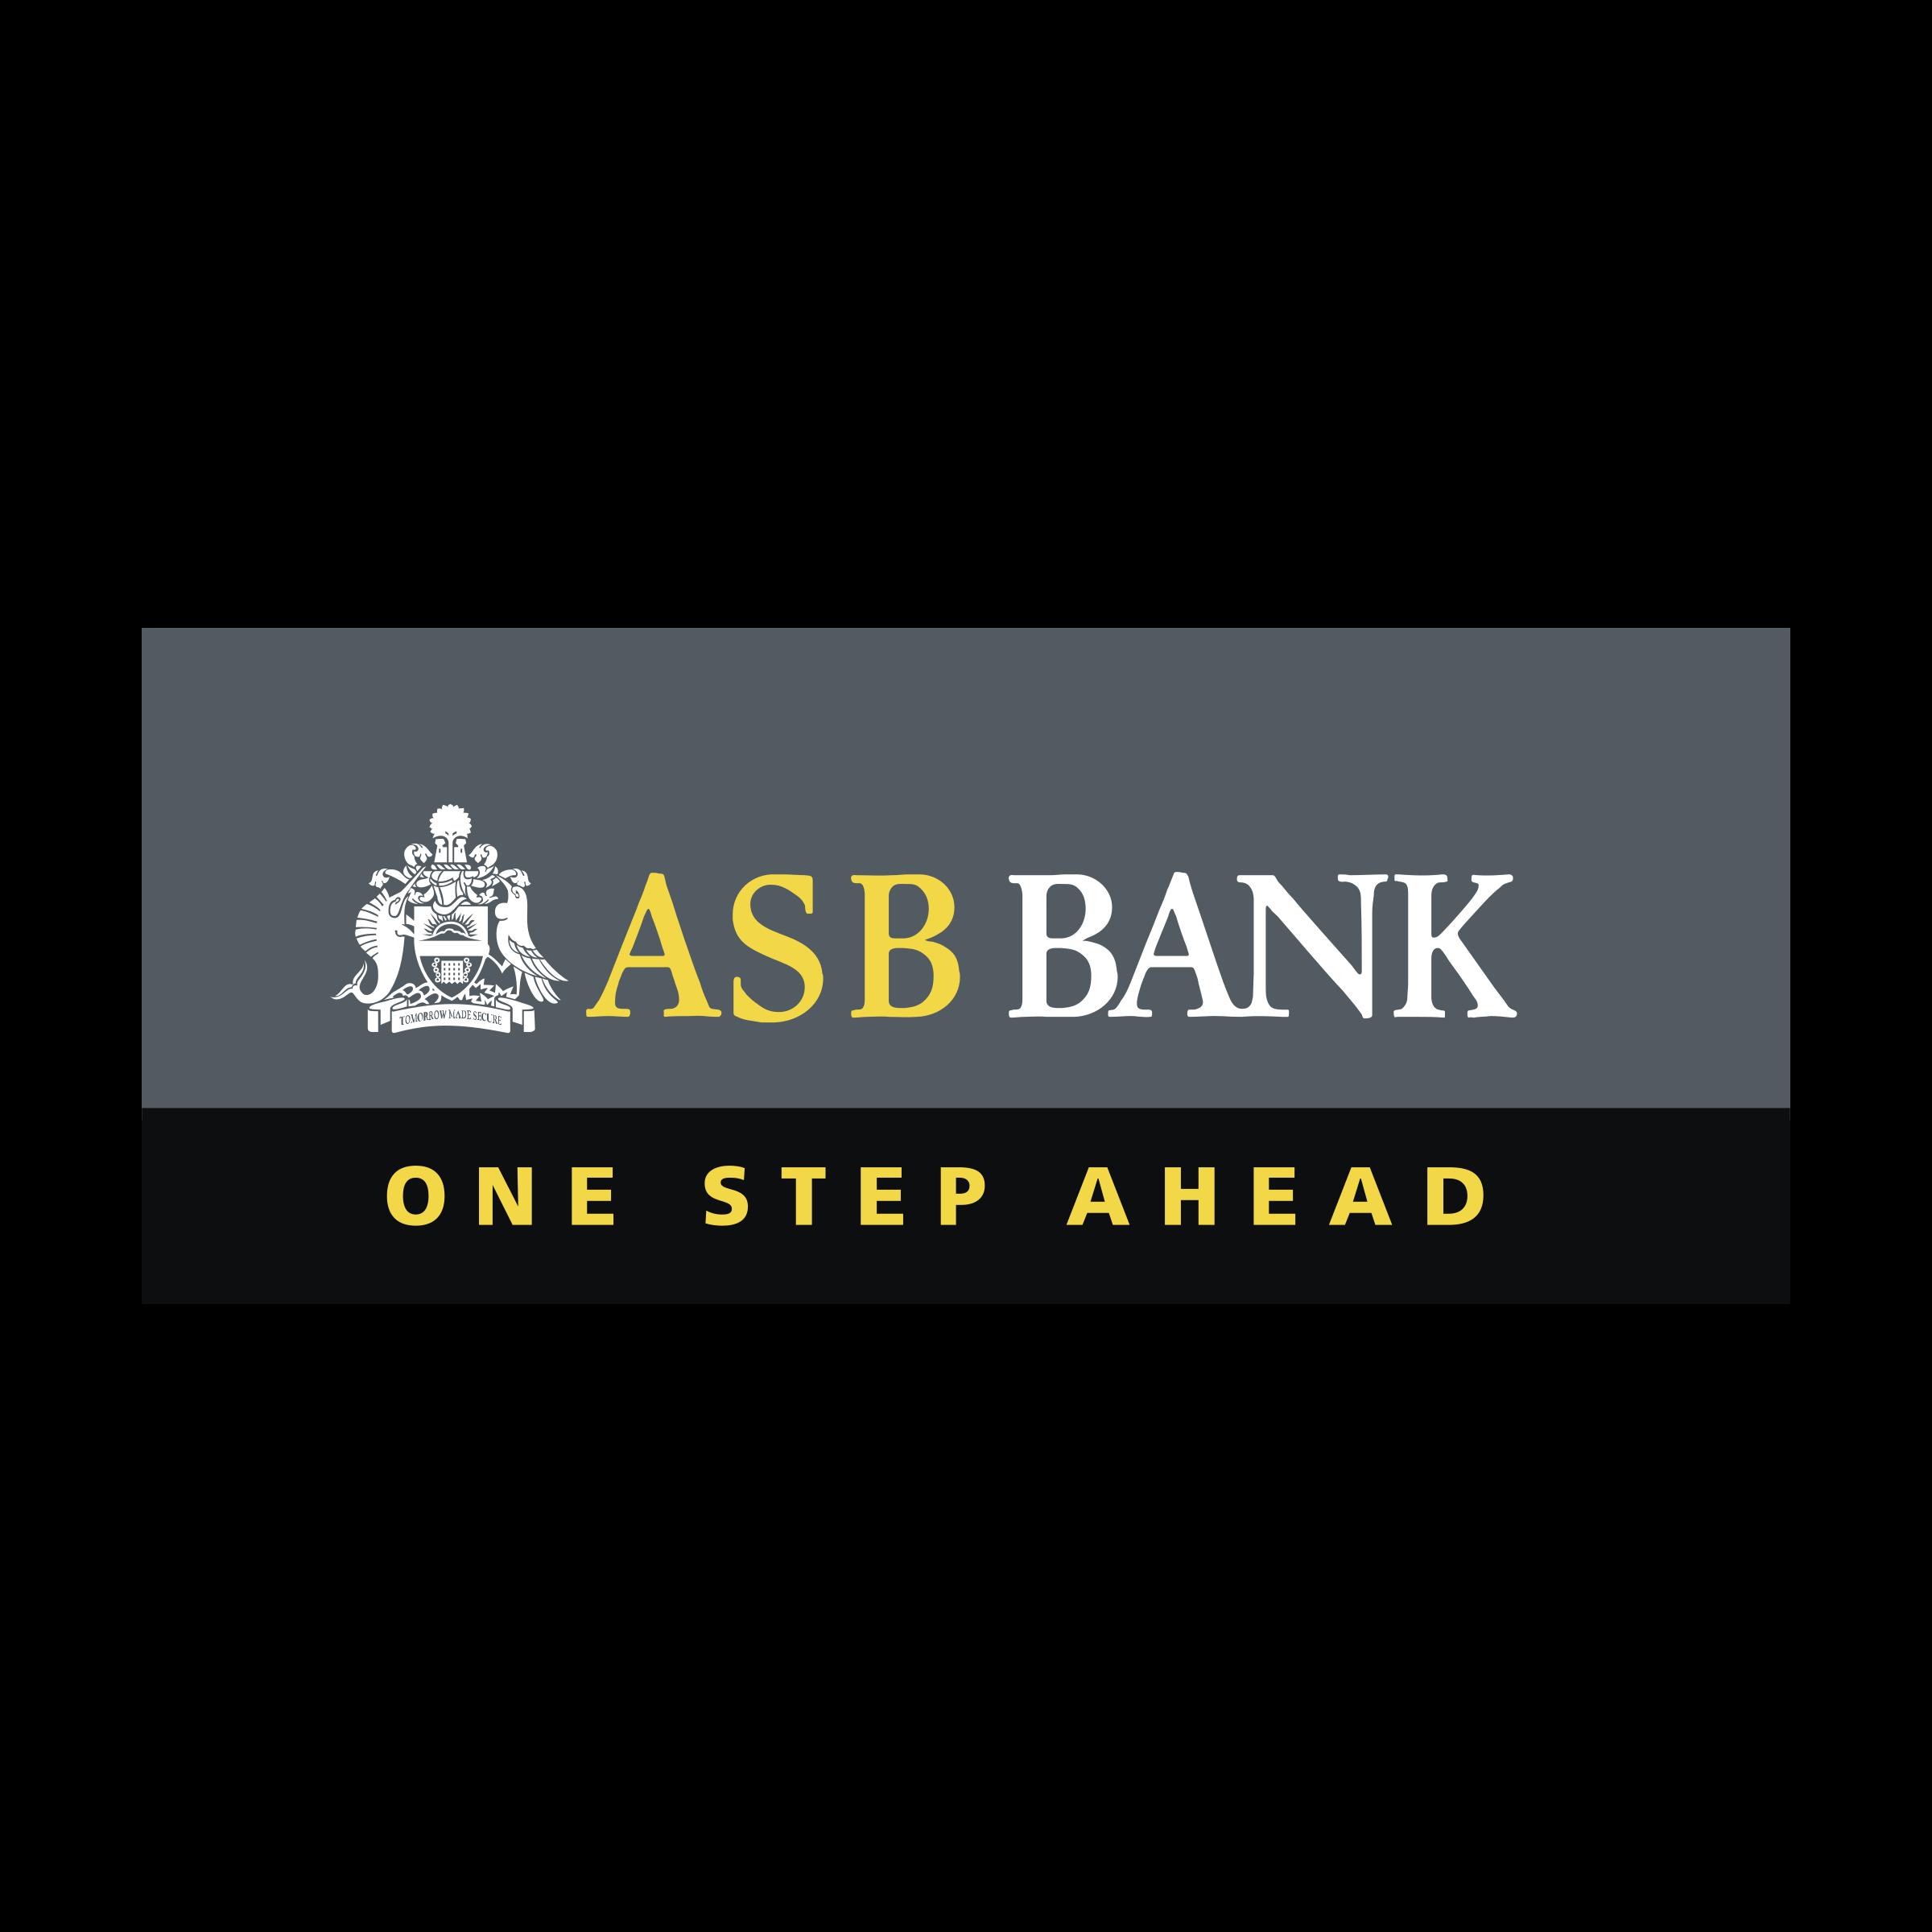 ASB Bank Logo PNG Transparent & SVG Vector - Freebie Supply